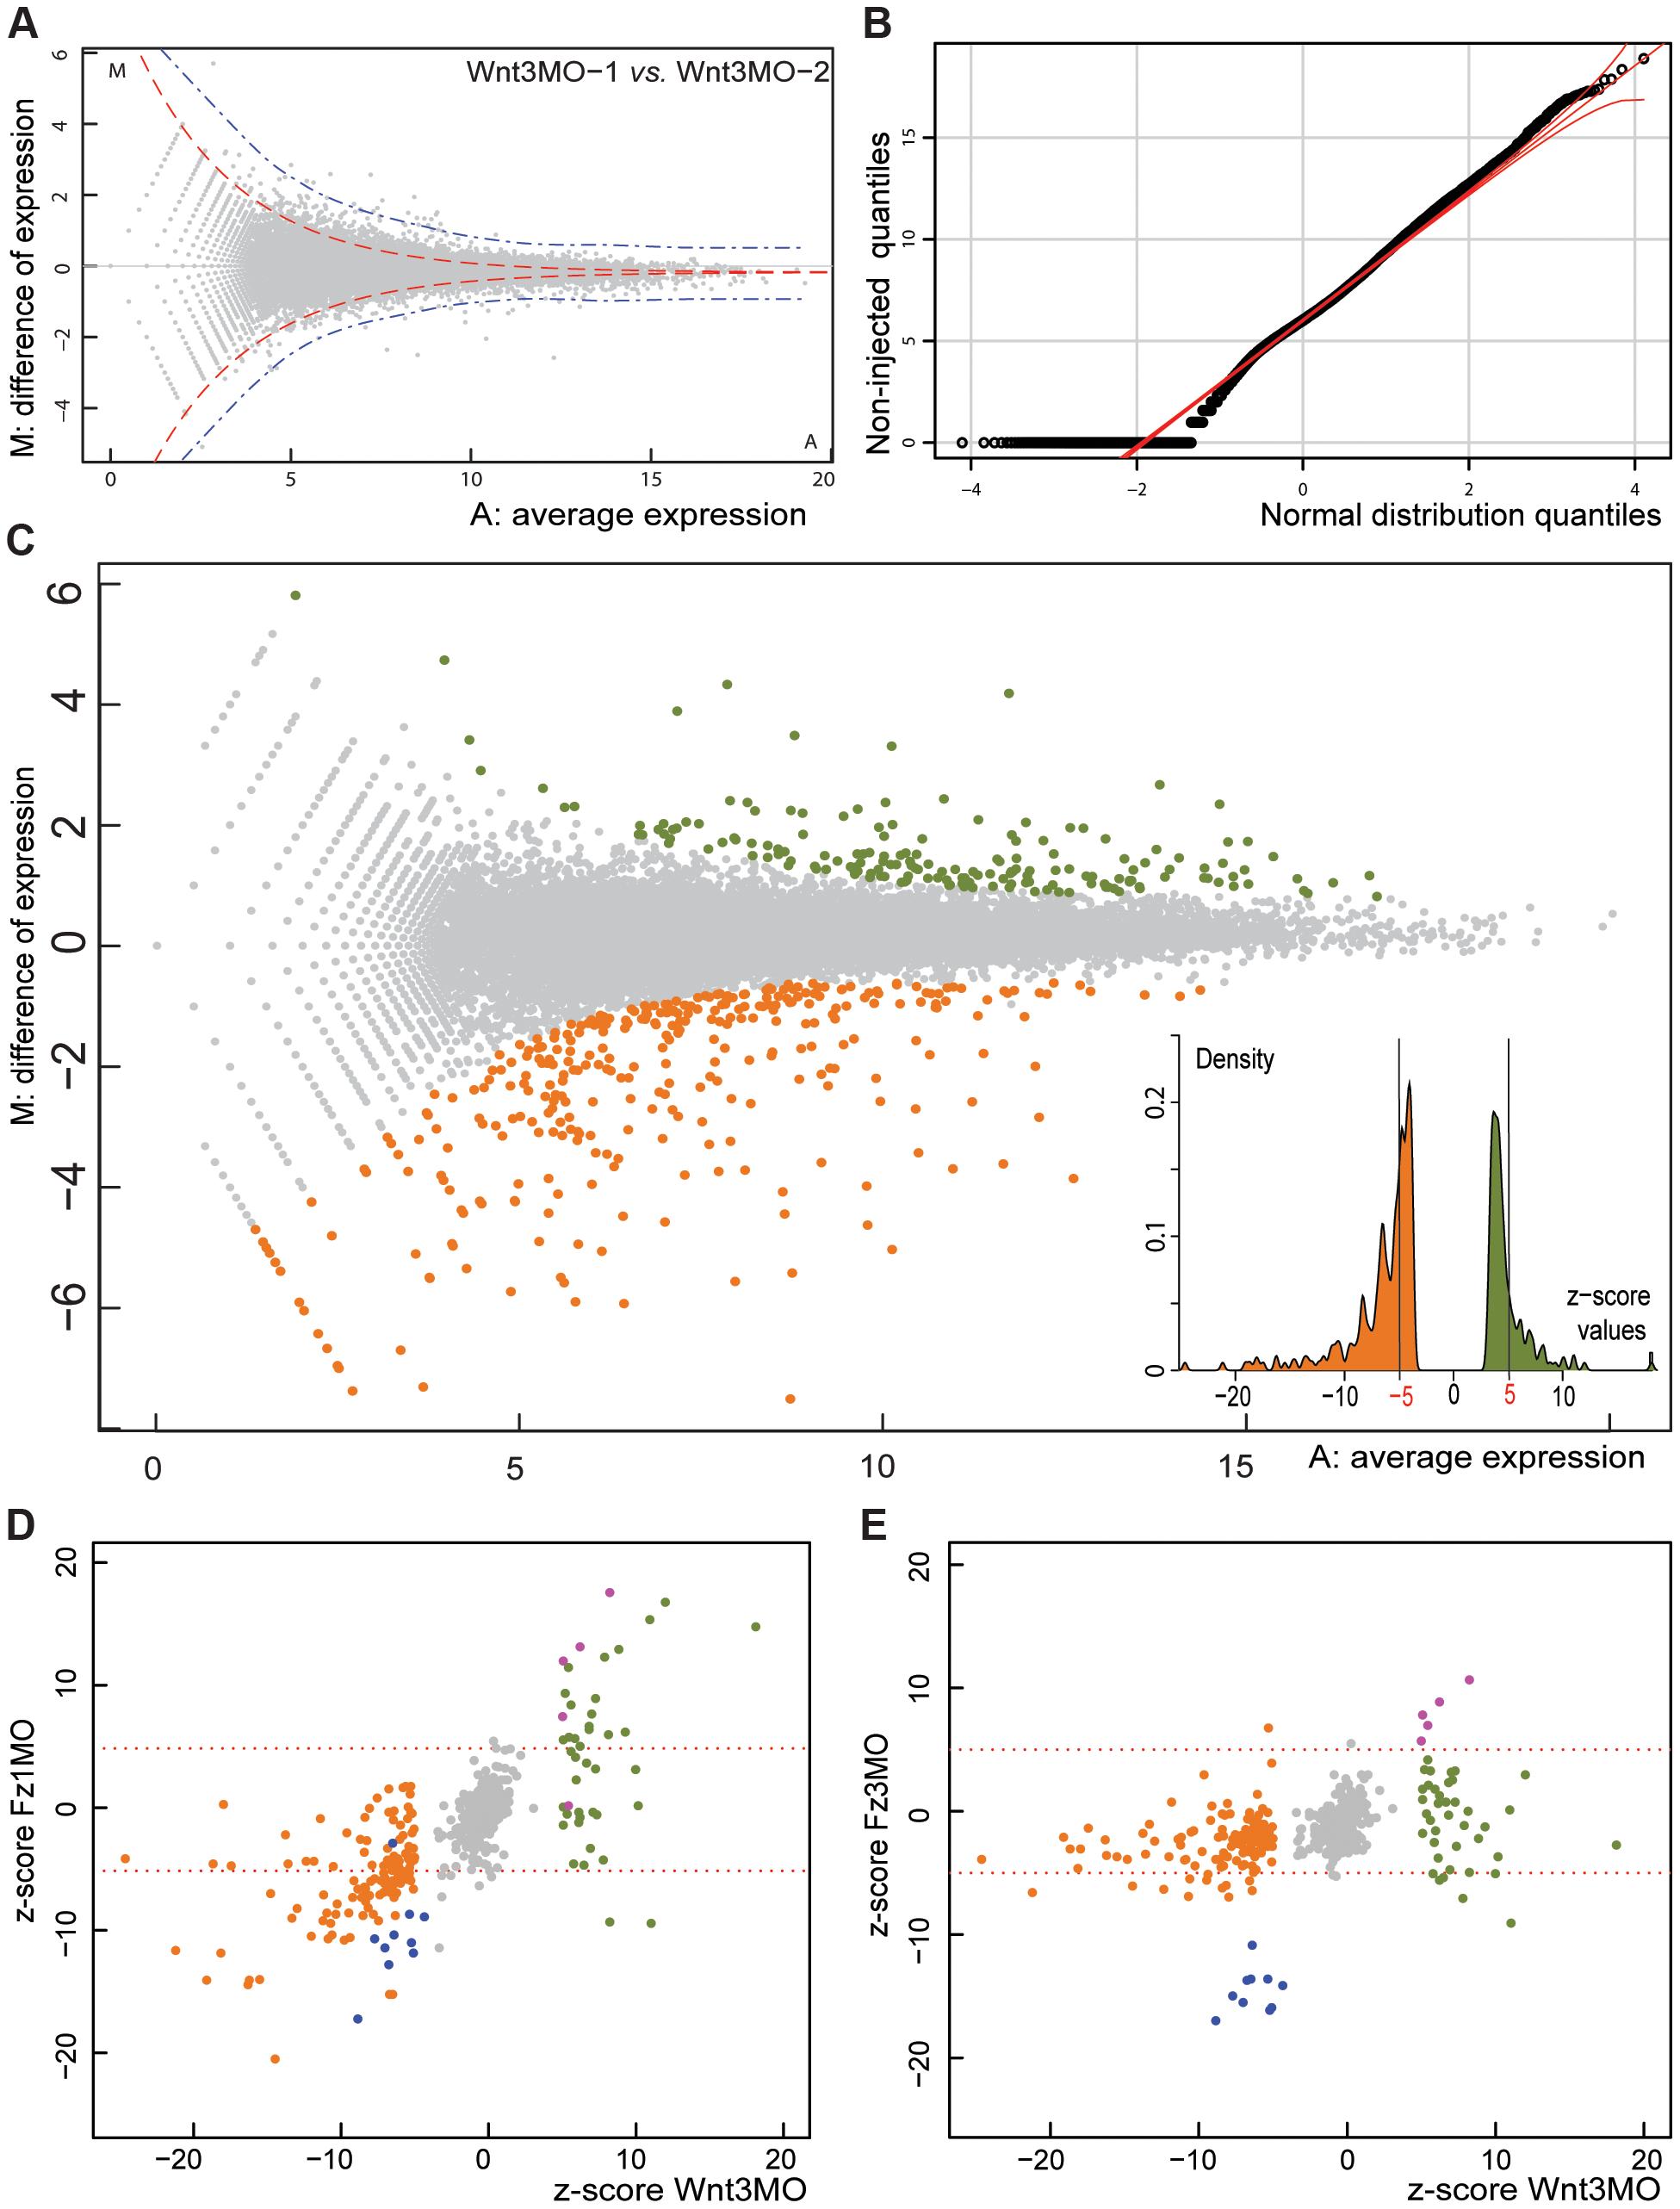 Identifying Clytia early gastrula patterning genes by DGE.